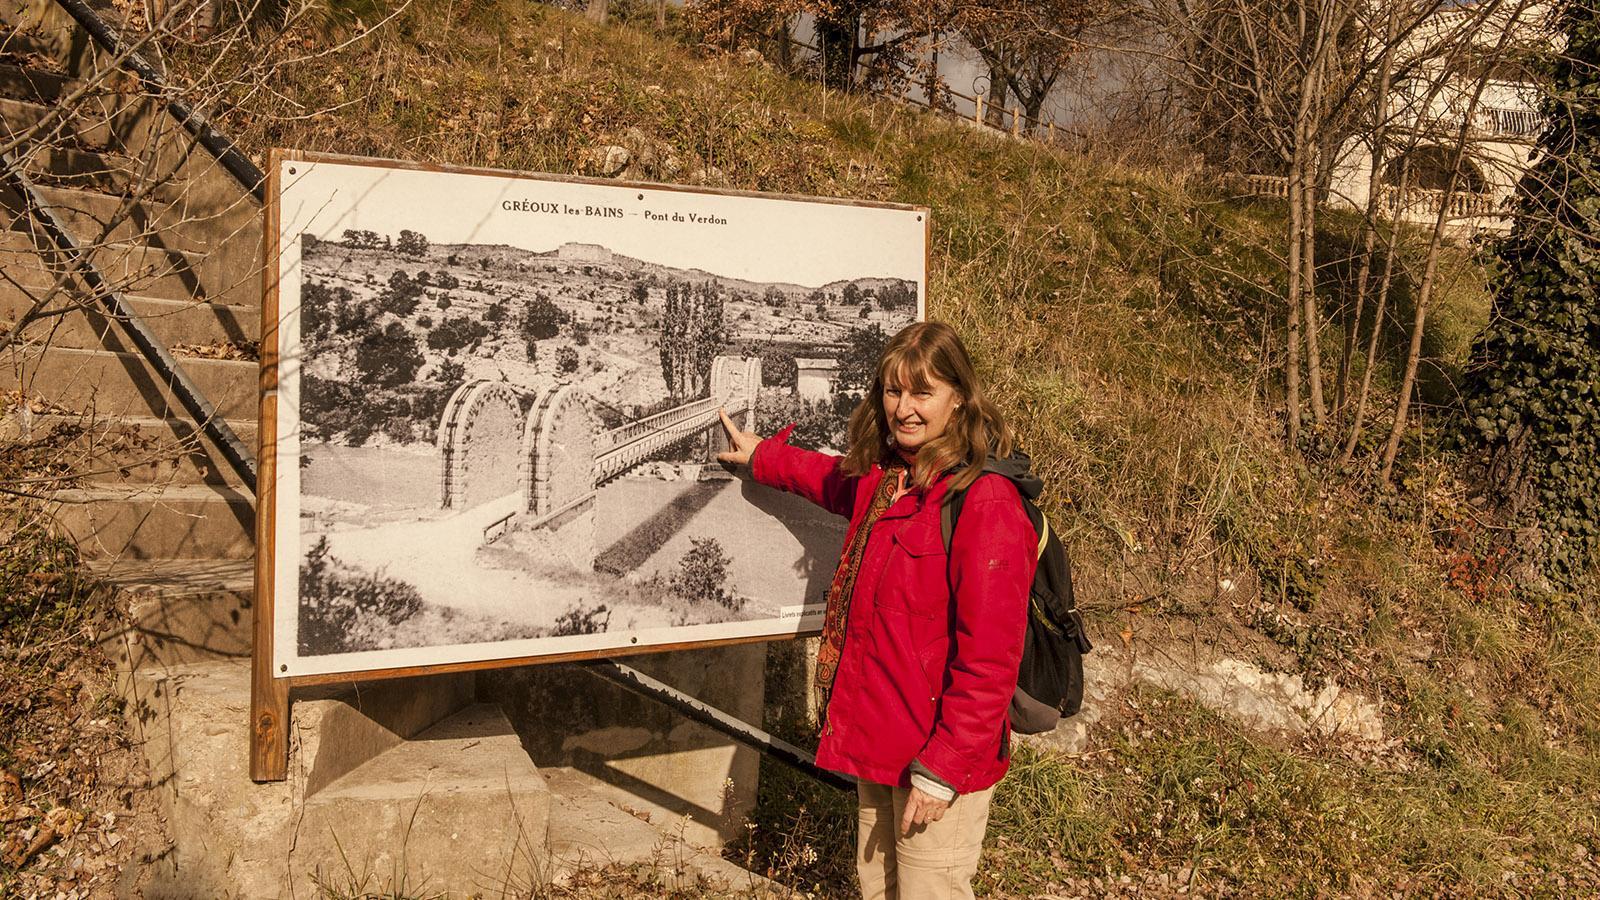 Gréoux-les-Bains: Stadtführerin Isabell Murach kann euch viel über den Verdon erzählen. Foto: Hilke Maunder